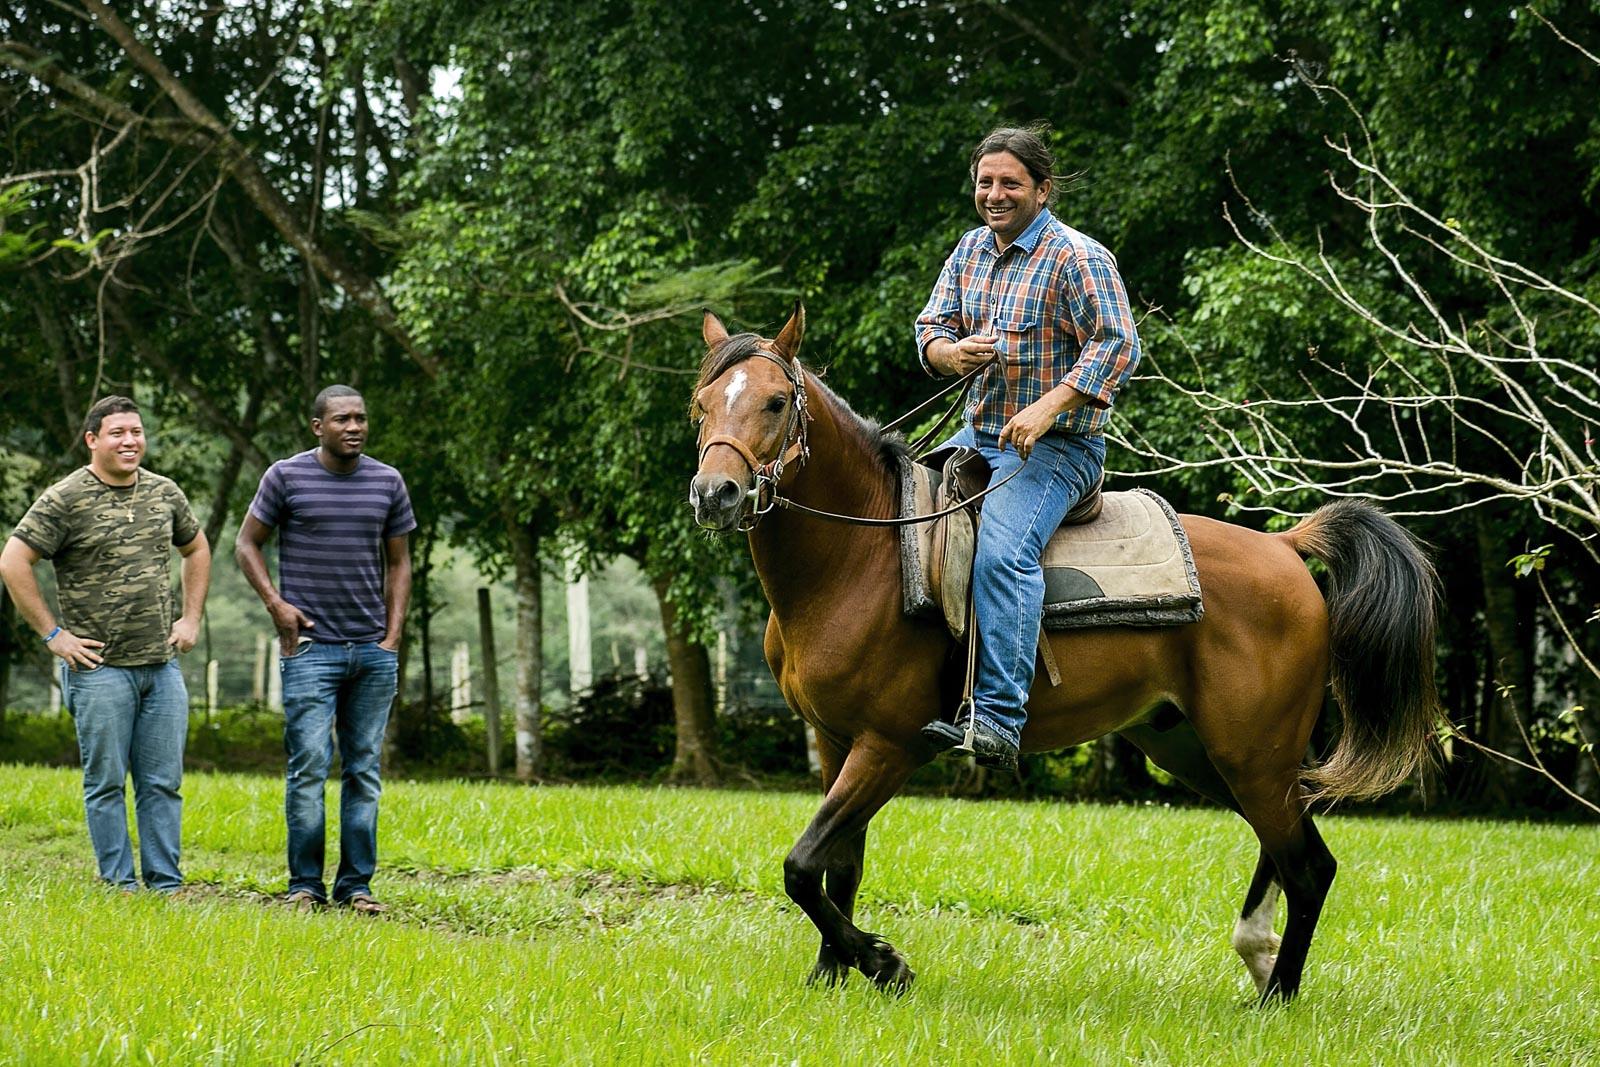 Pratt_Hanna-Stables-Belize-Horseback-Riding_04.jpg